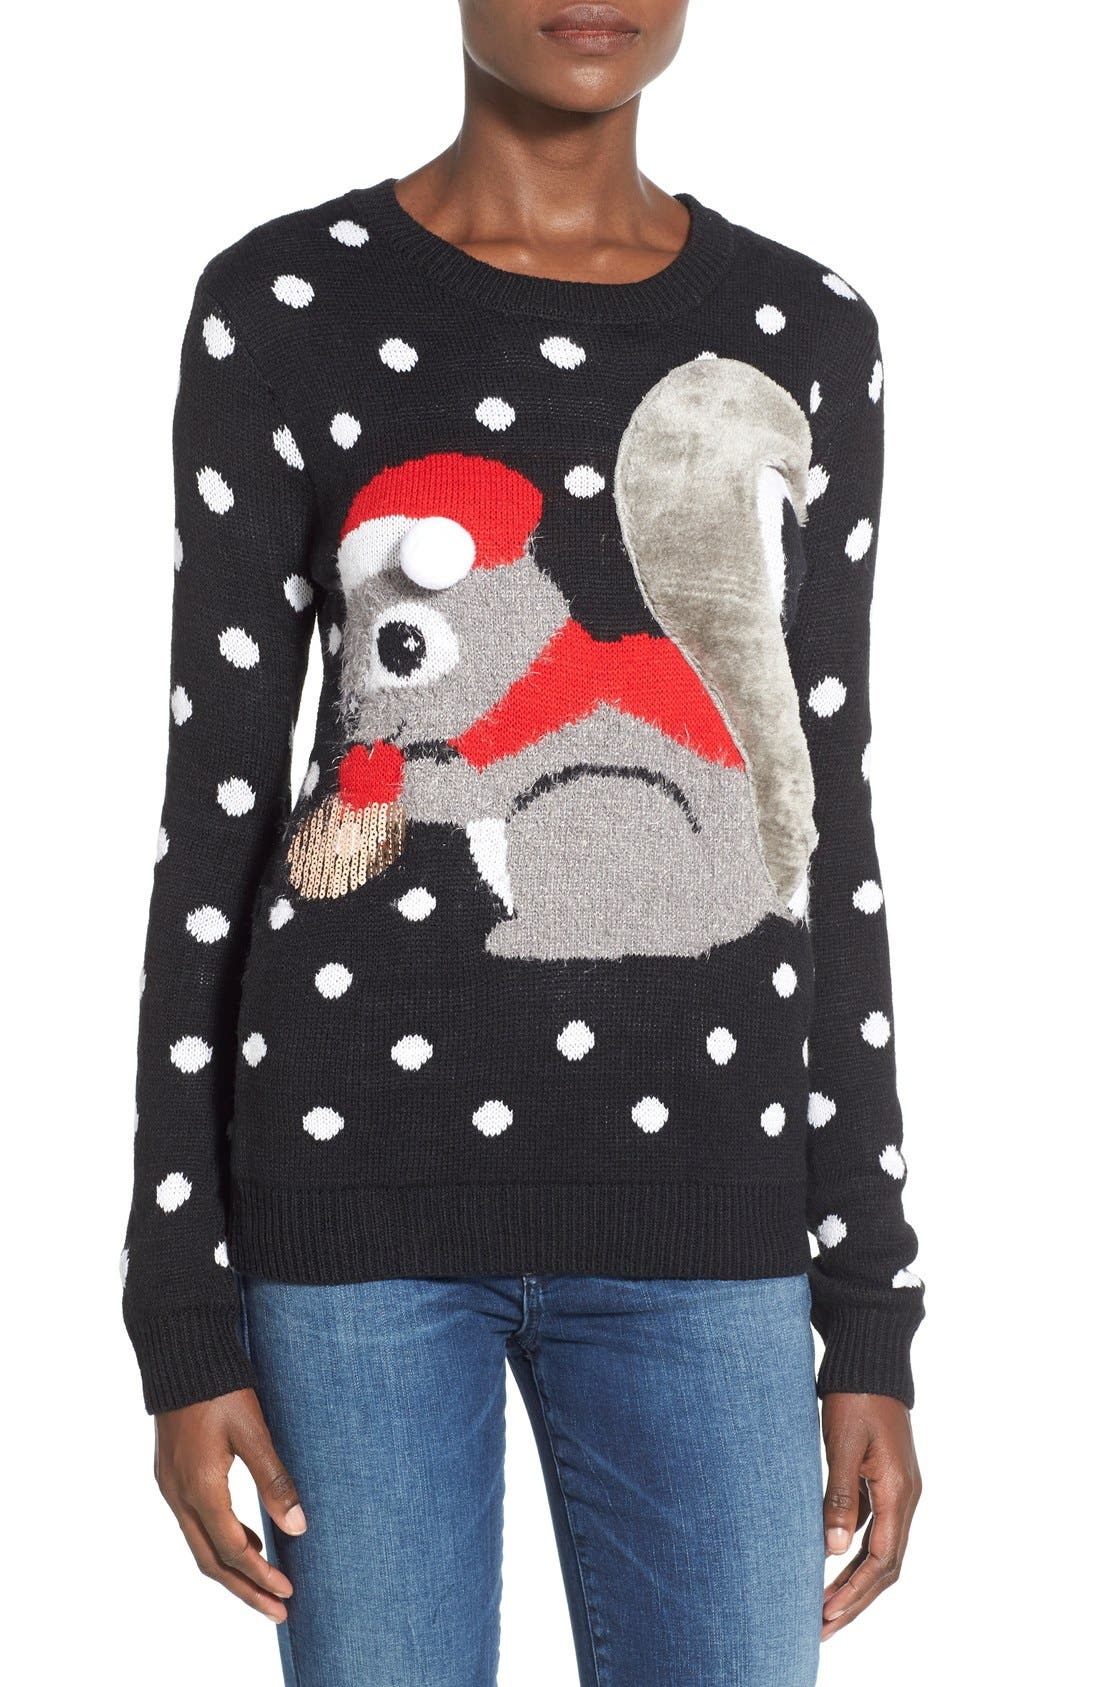 Main Image - Ten Sixty Sherman Squirrel Christmas Sweater